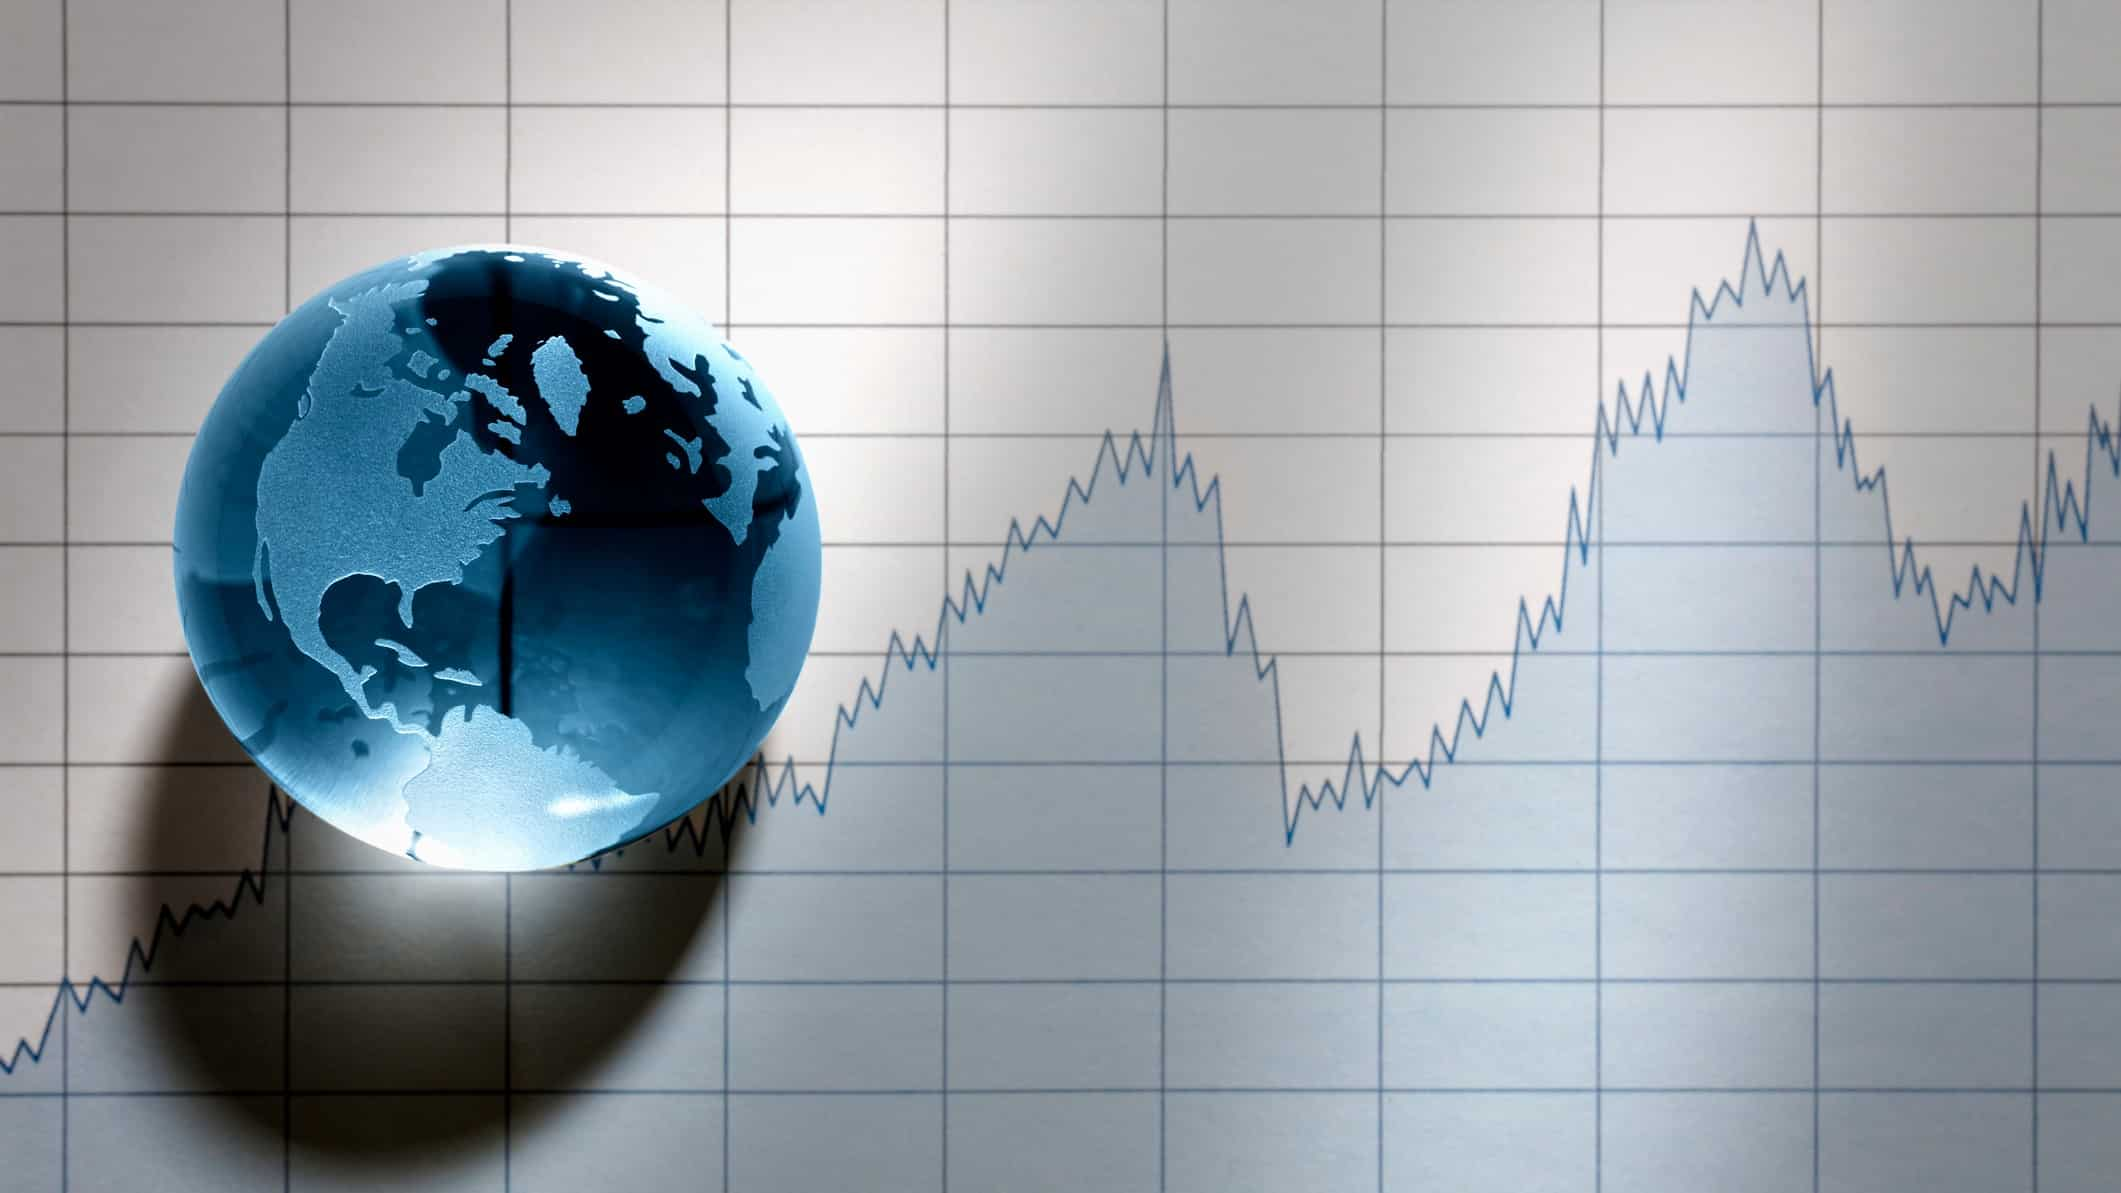 World globe sitting on top of share price chart